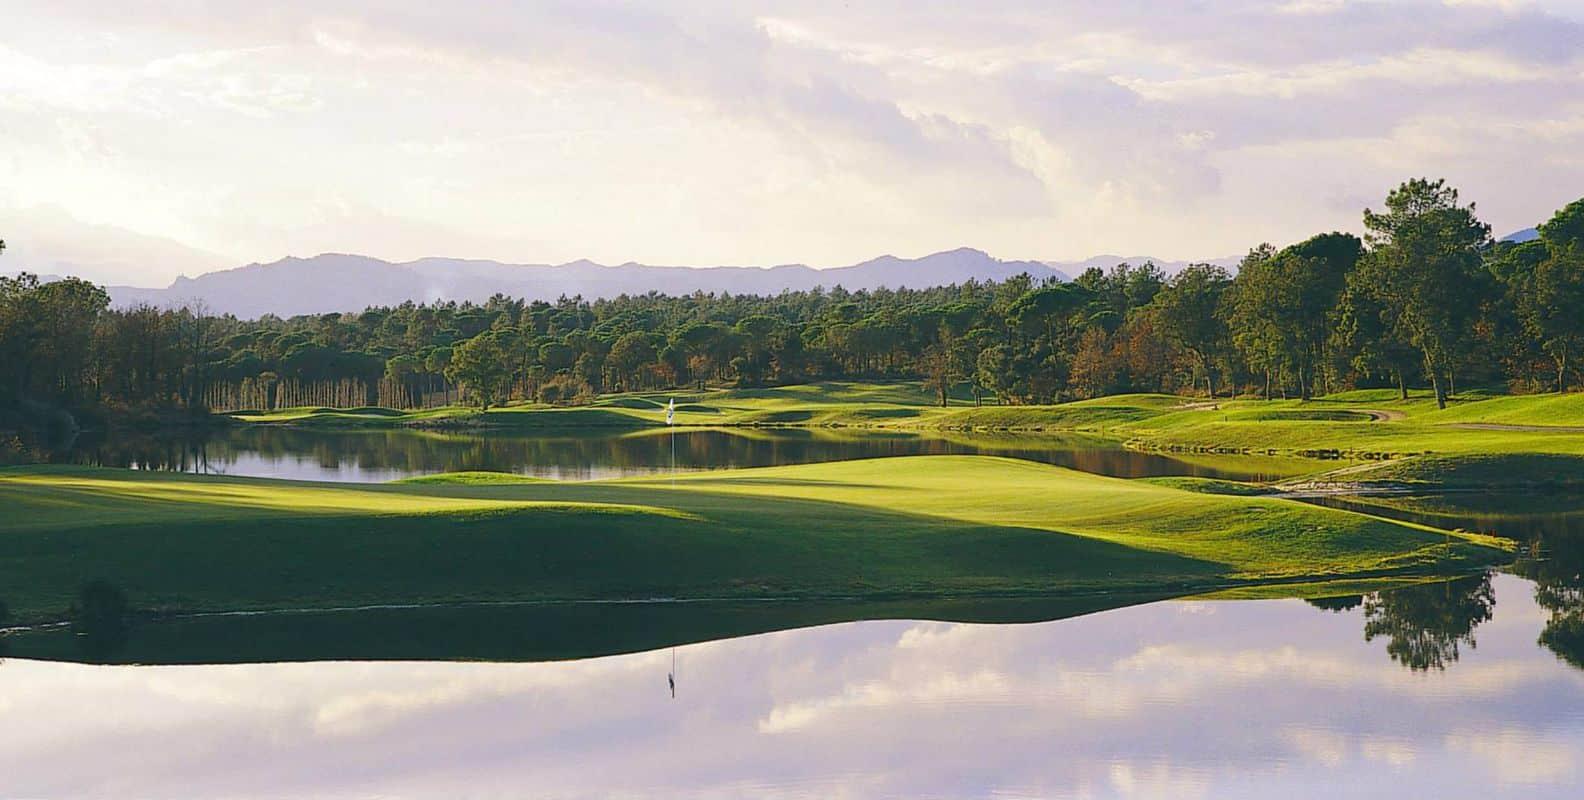 pga-catlunya-golf-3